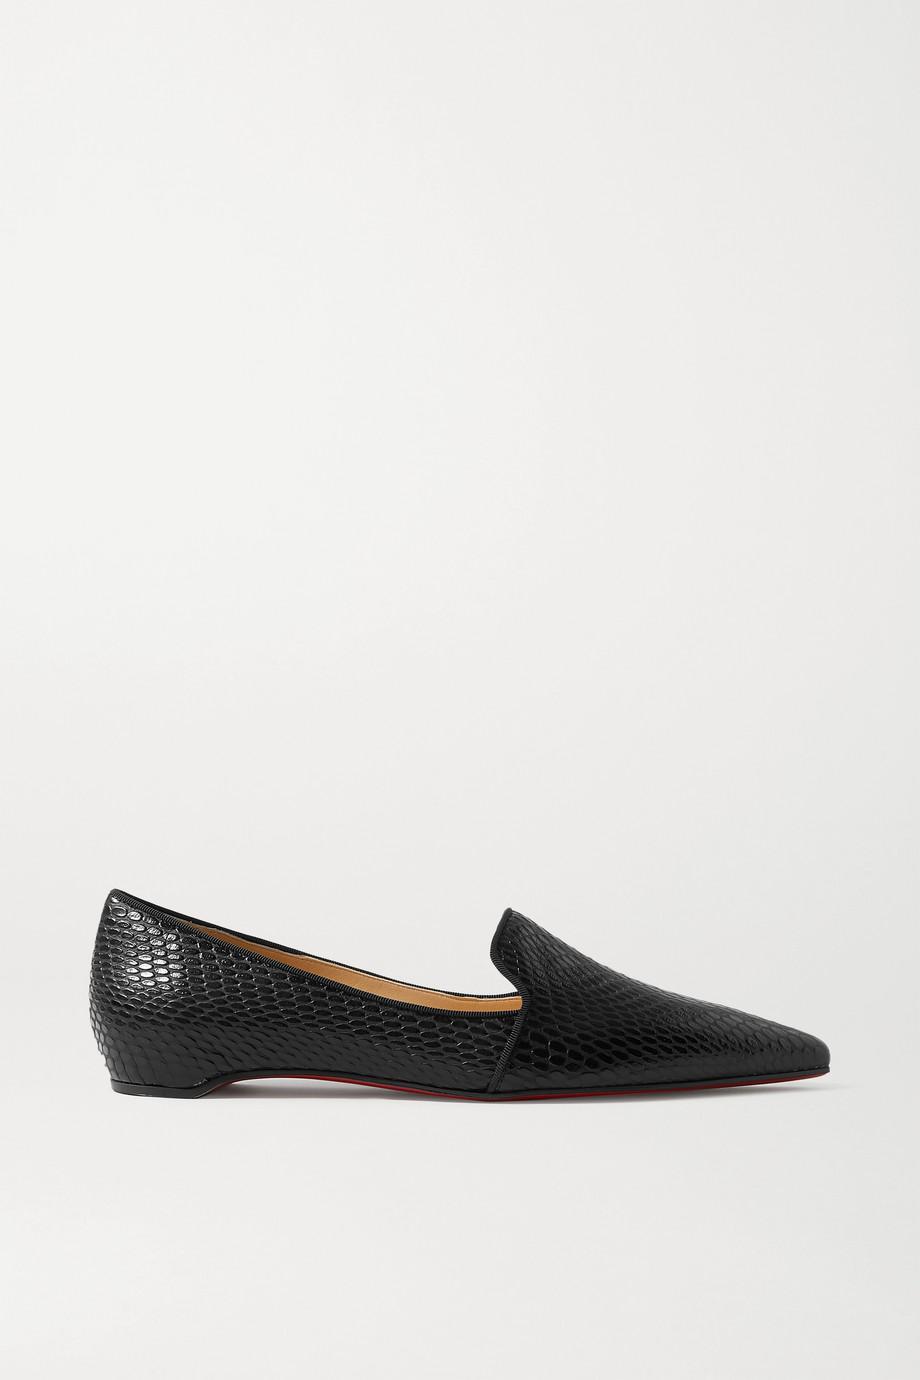 Christian Louboutin Kashasha lizard-effect leather loafers